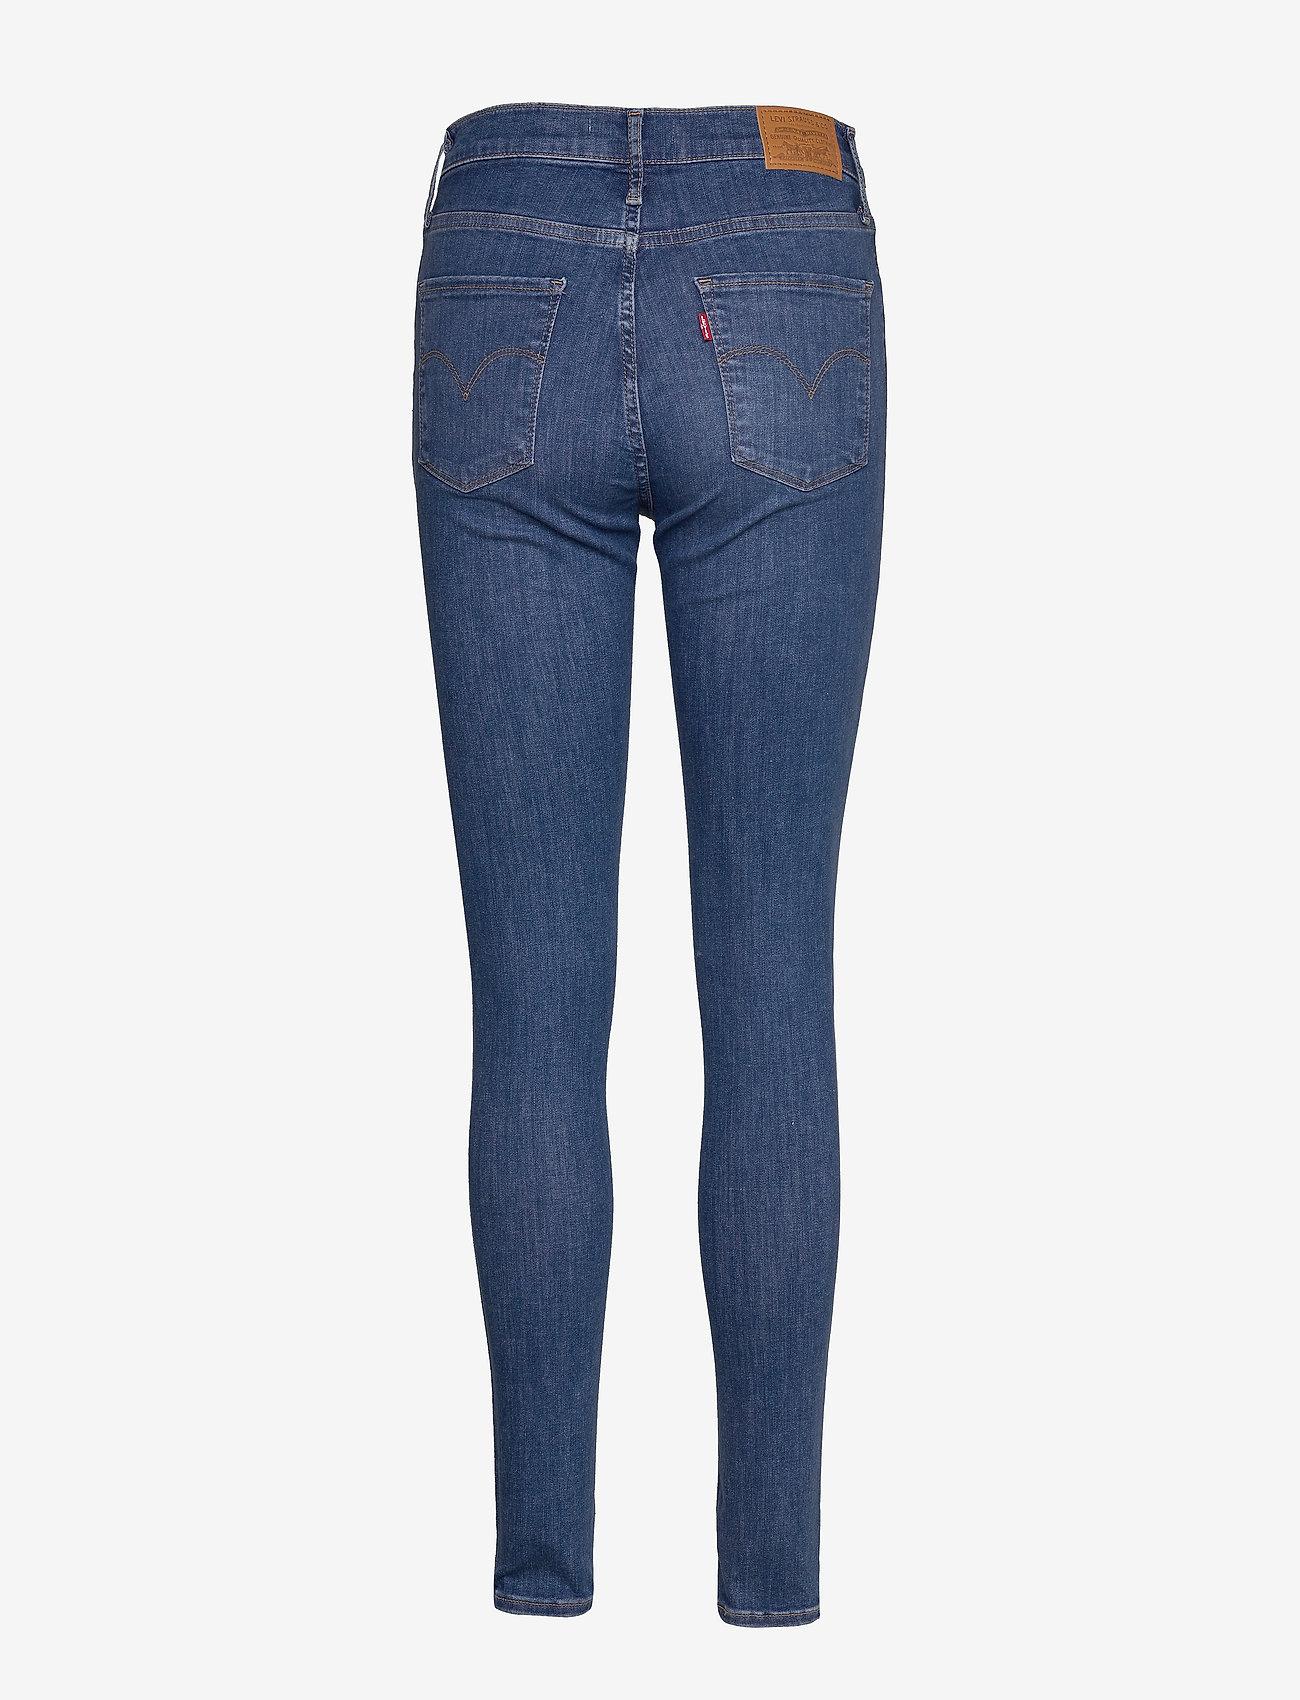 LEVI´S Women - 720 HIRISE SUPER SKINNY ECLIPS - skinny jeans - med indigo - worn in - 1